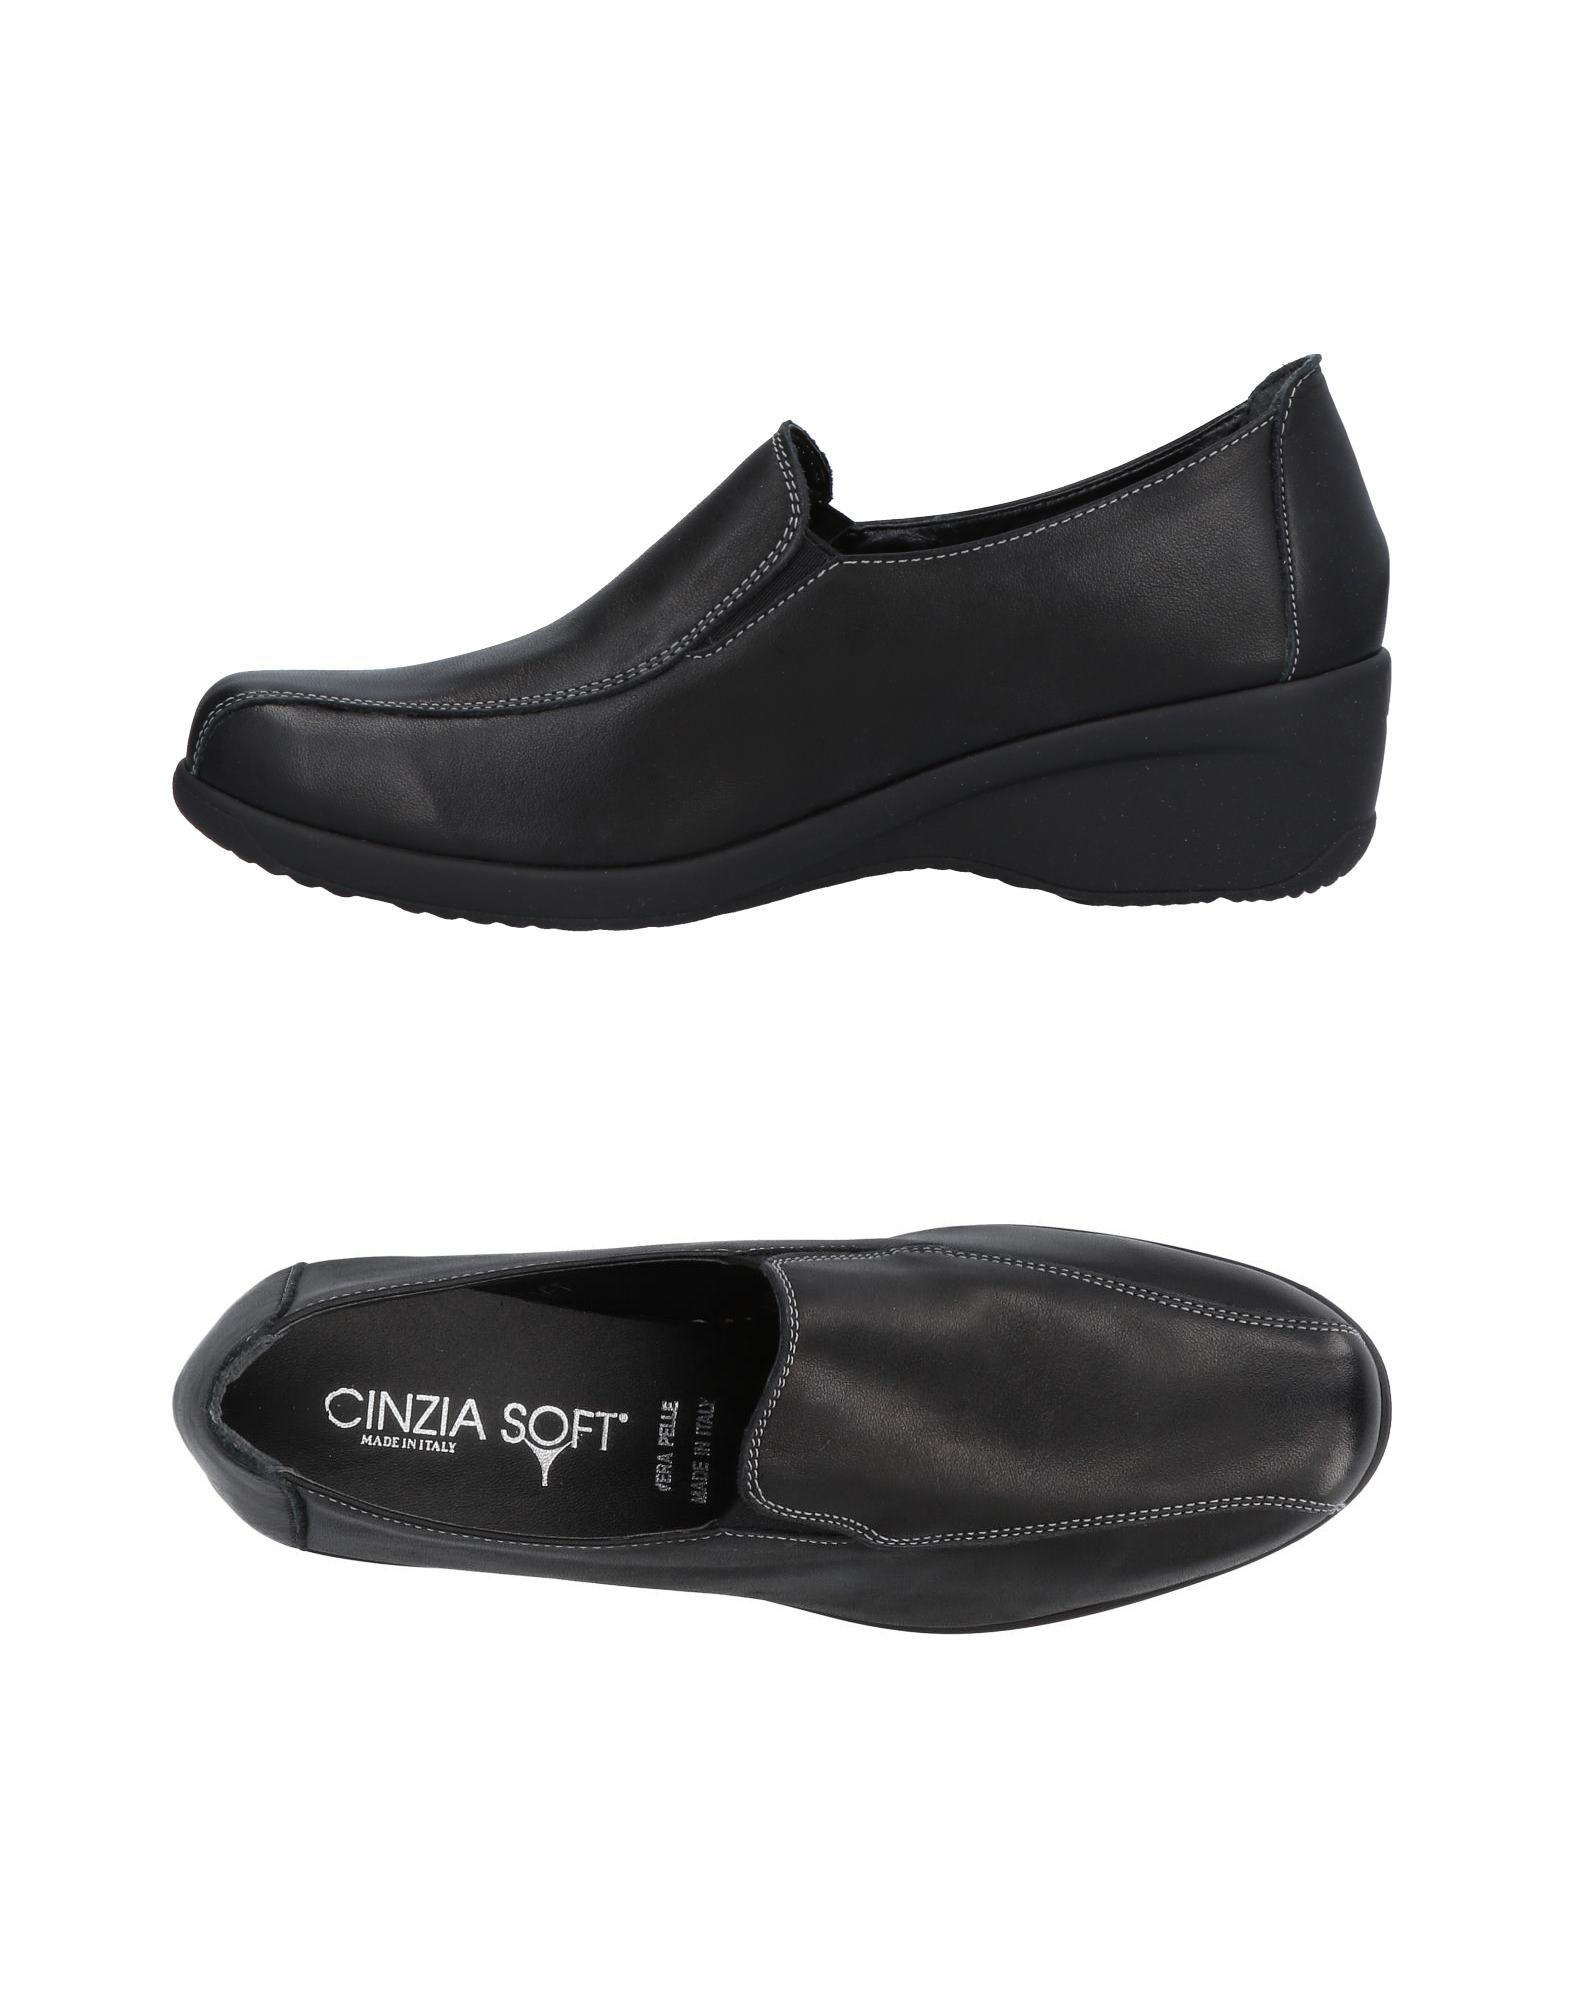 Cinzia Soft By Women Mauri Moda Loafers - Women By Cinzia Soft By Mauri Moda Loafers online on  Canada - 11467905PS 1eee91